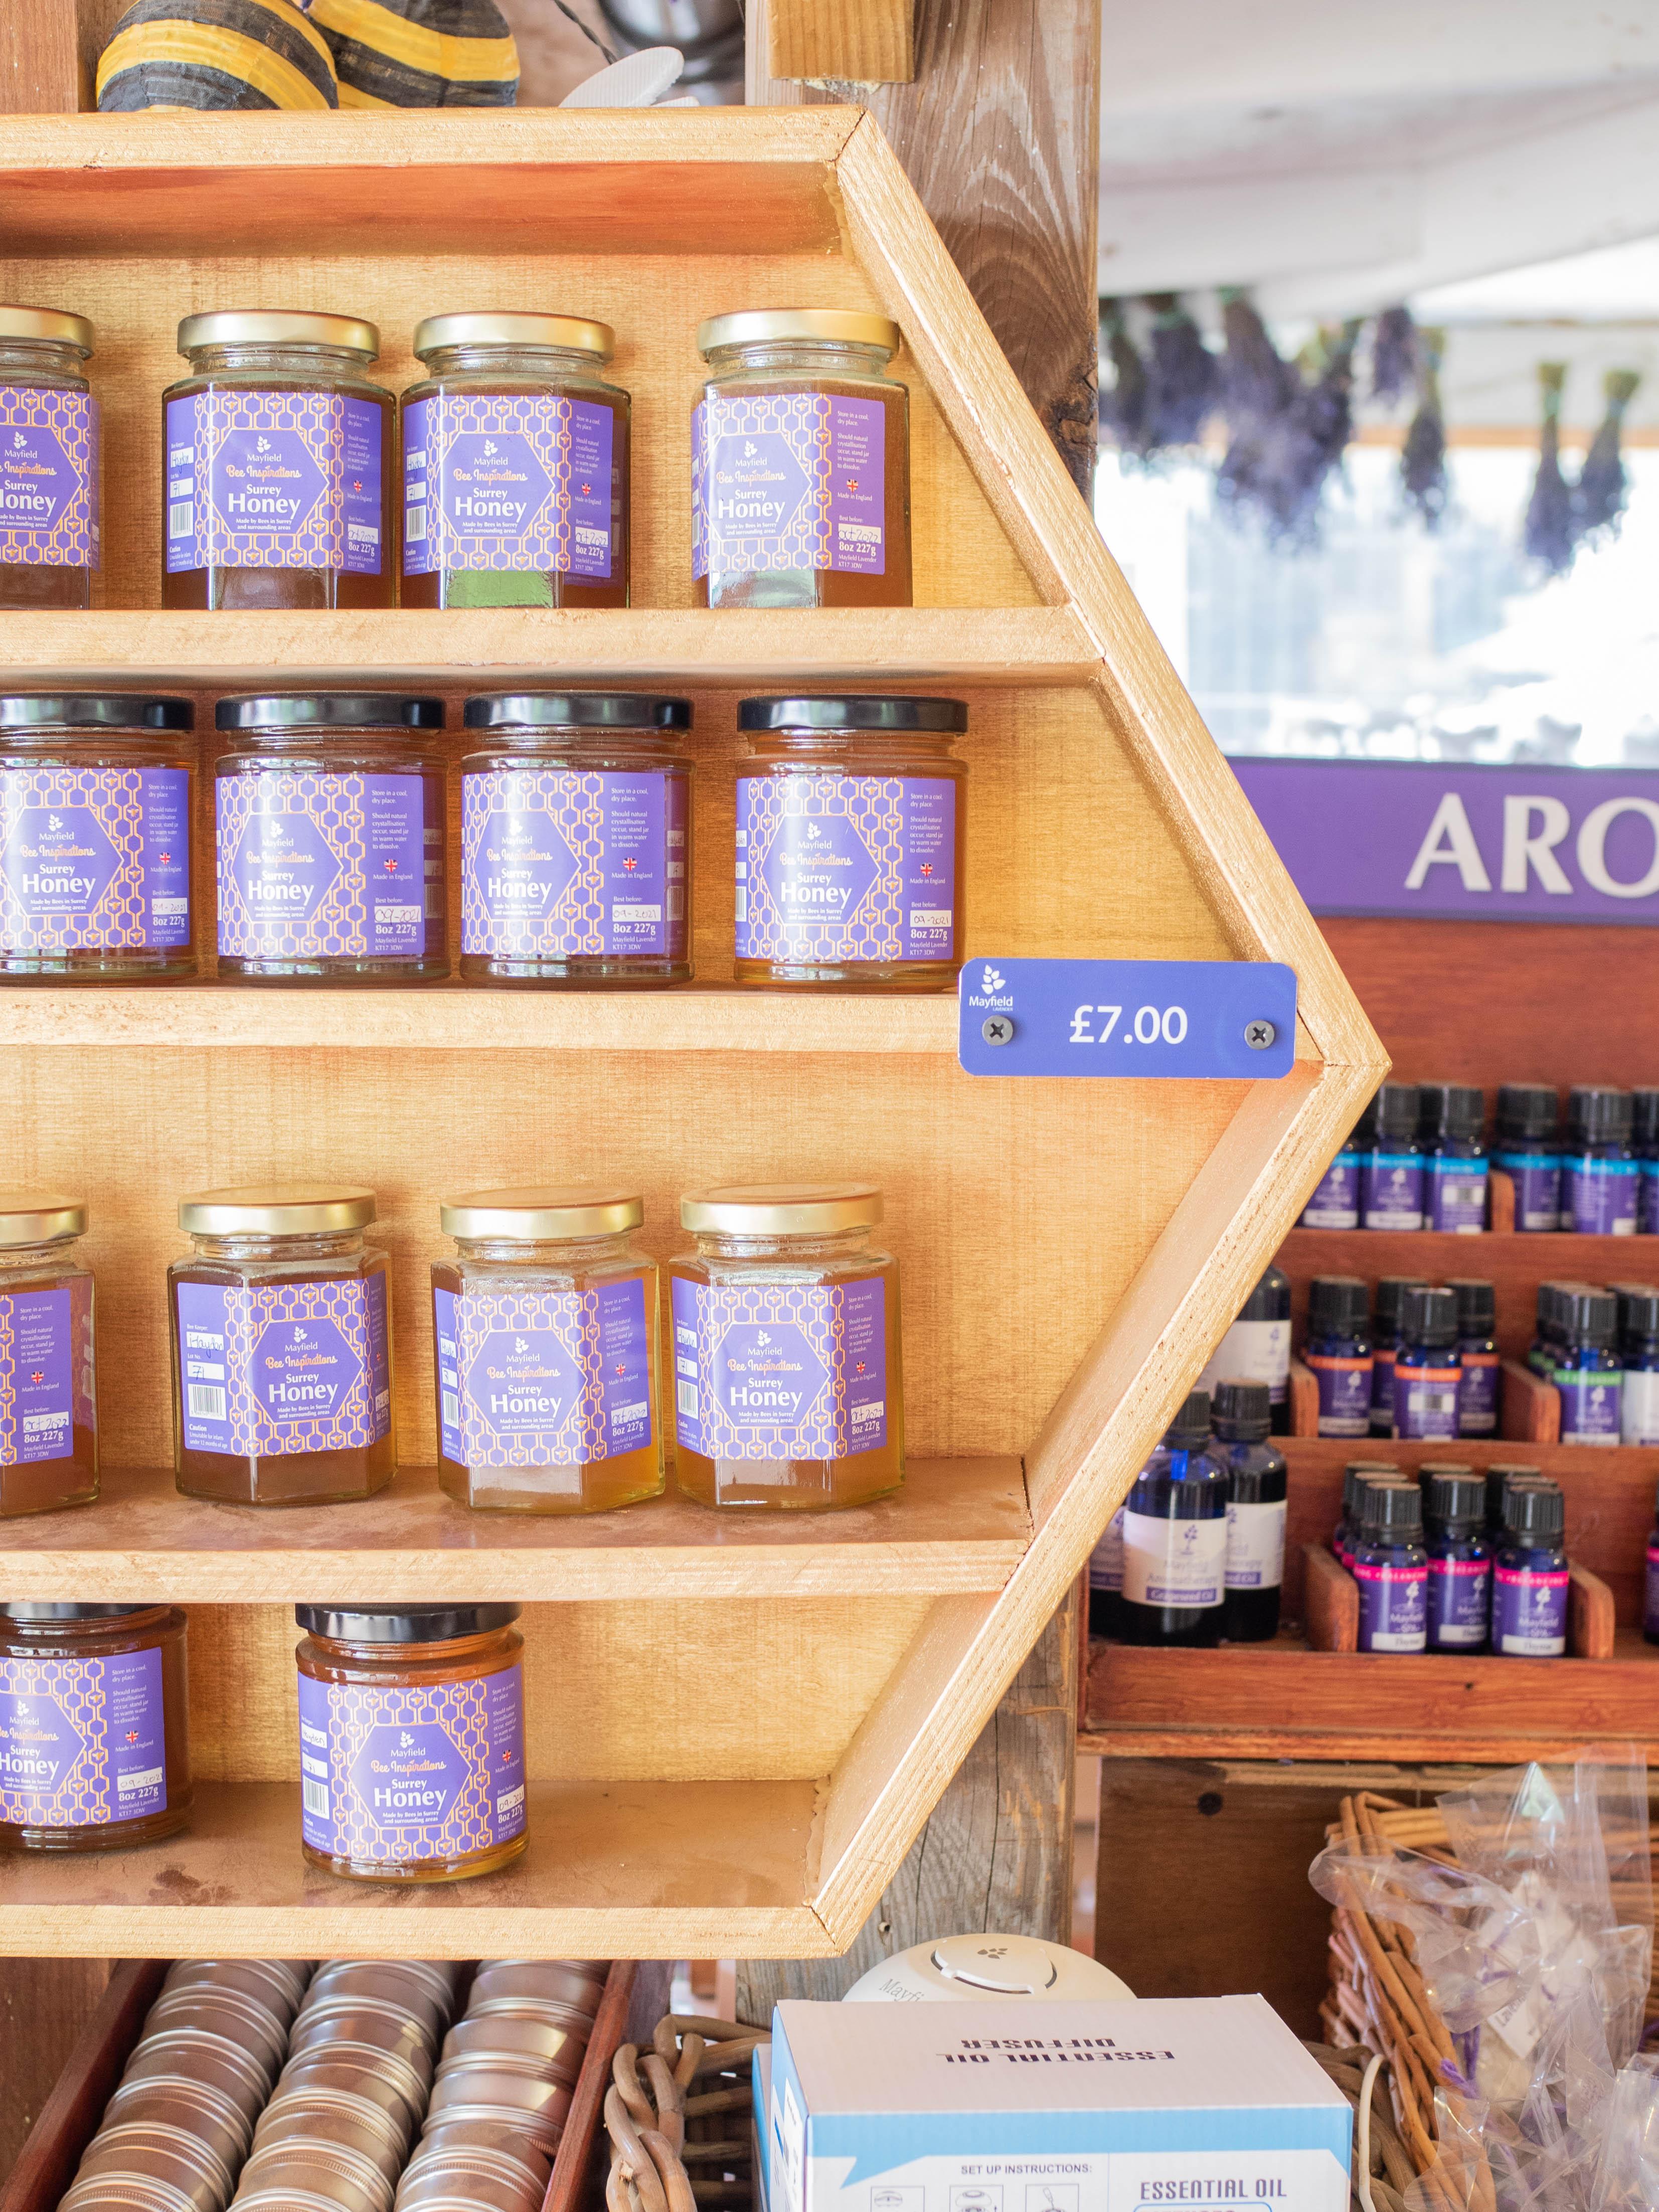 Jars of honey on display at Mayfield Lavender Farm